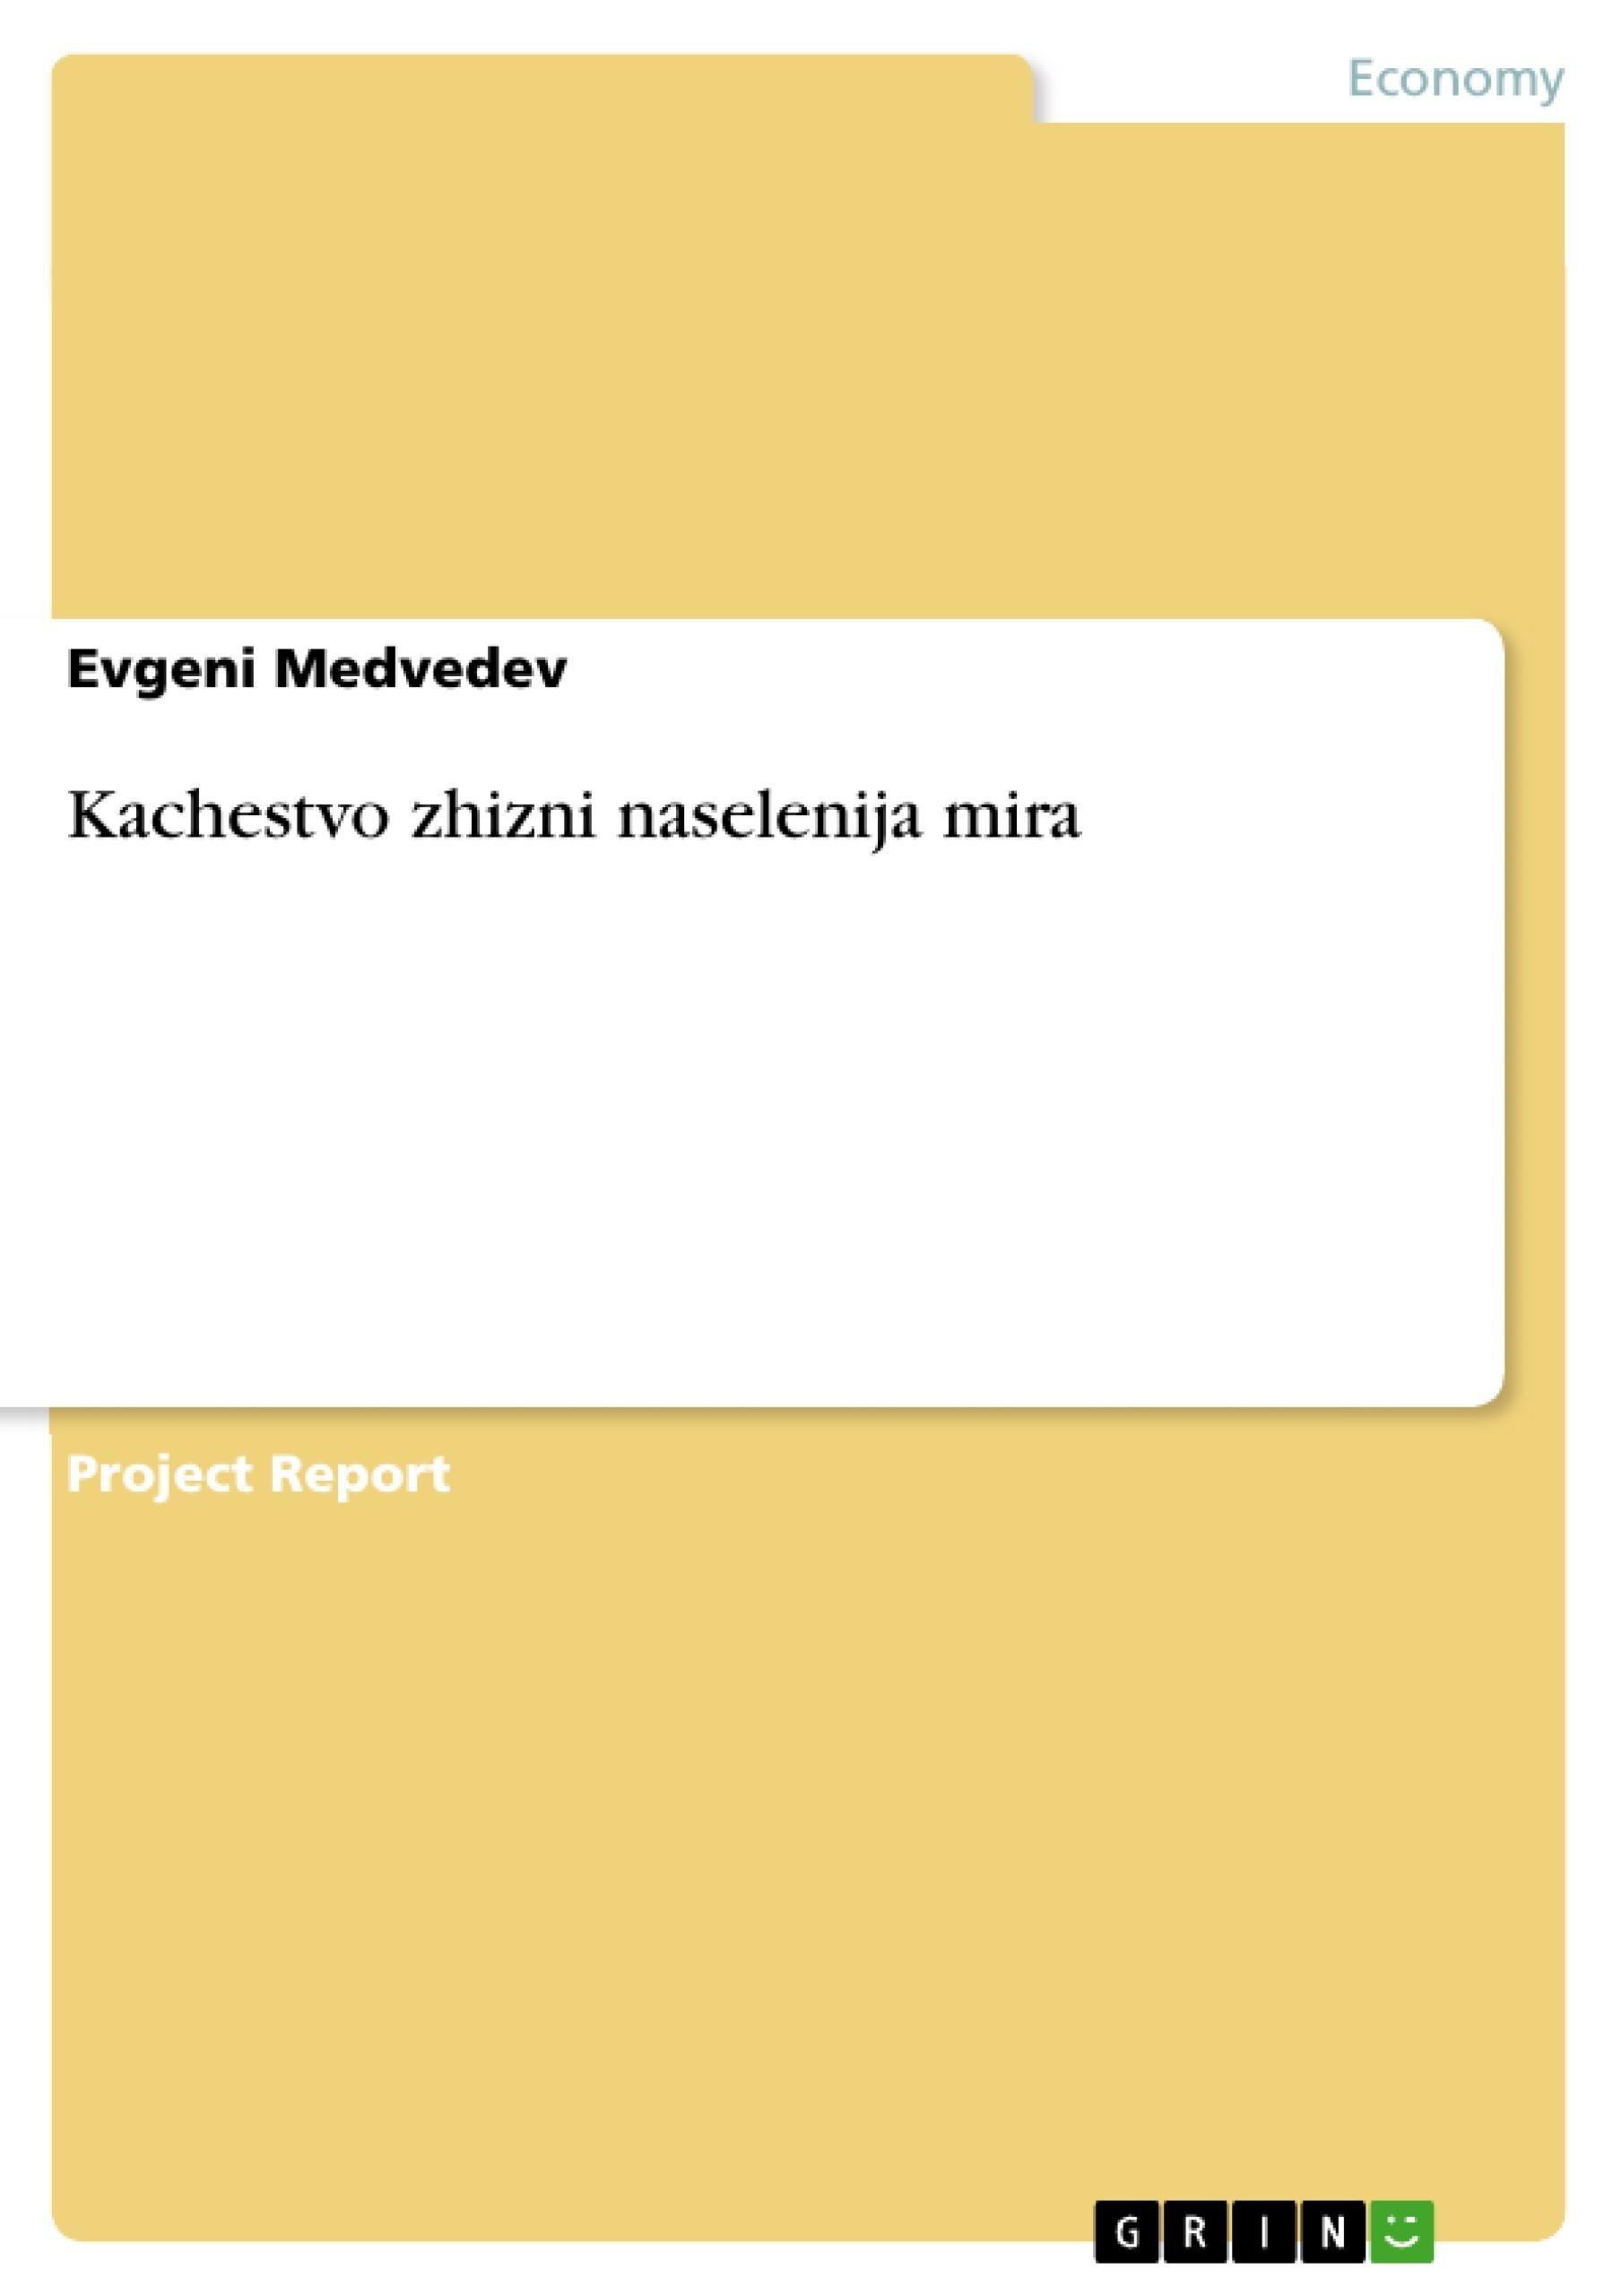 Title: Kachestvo zhizni naselenija mira